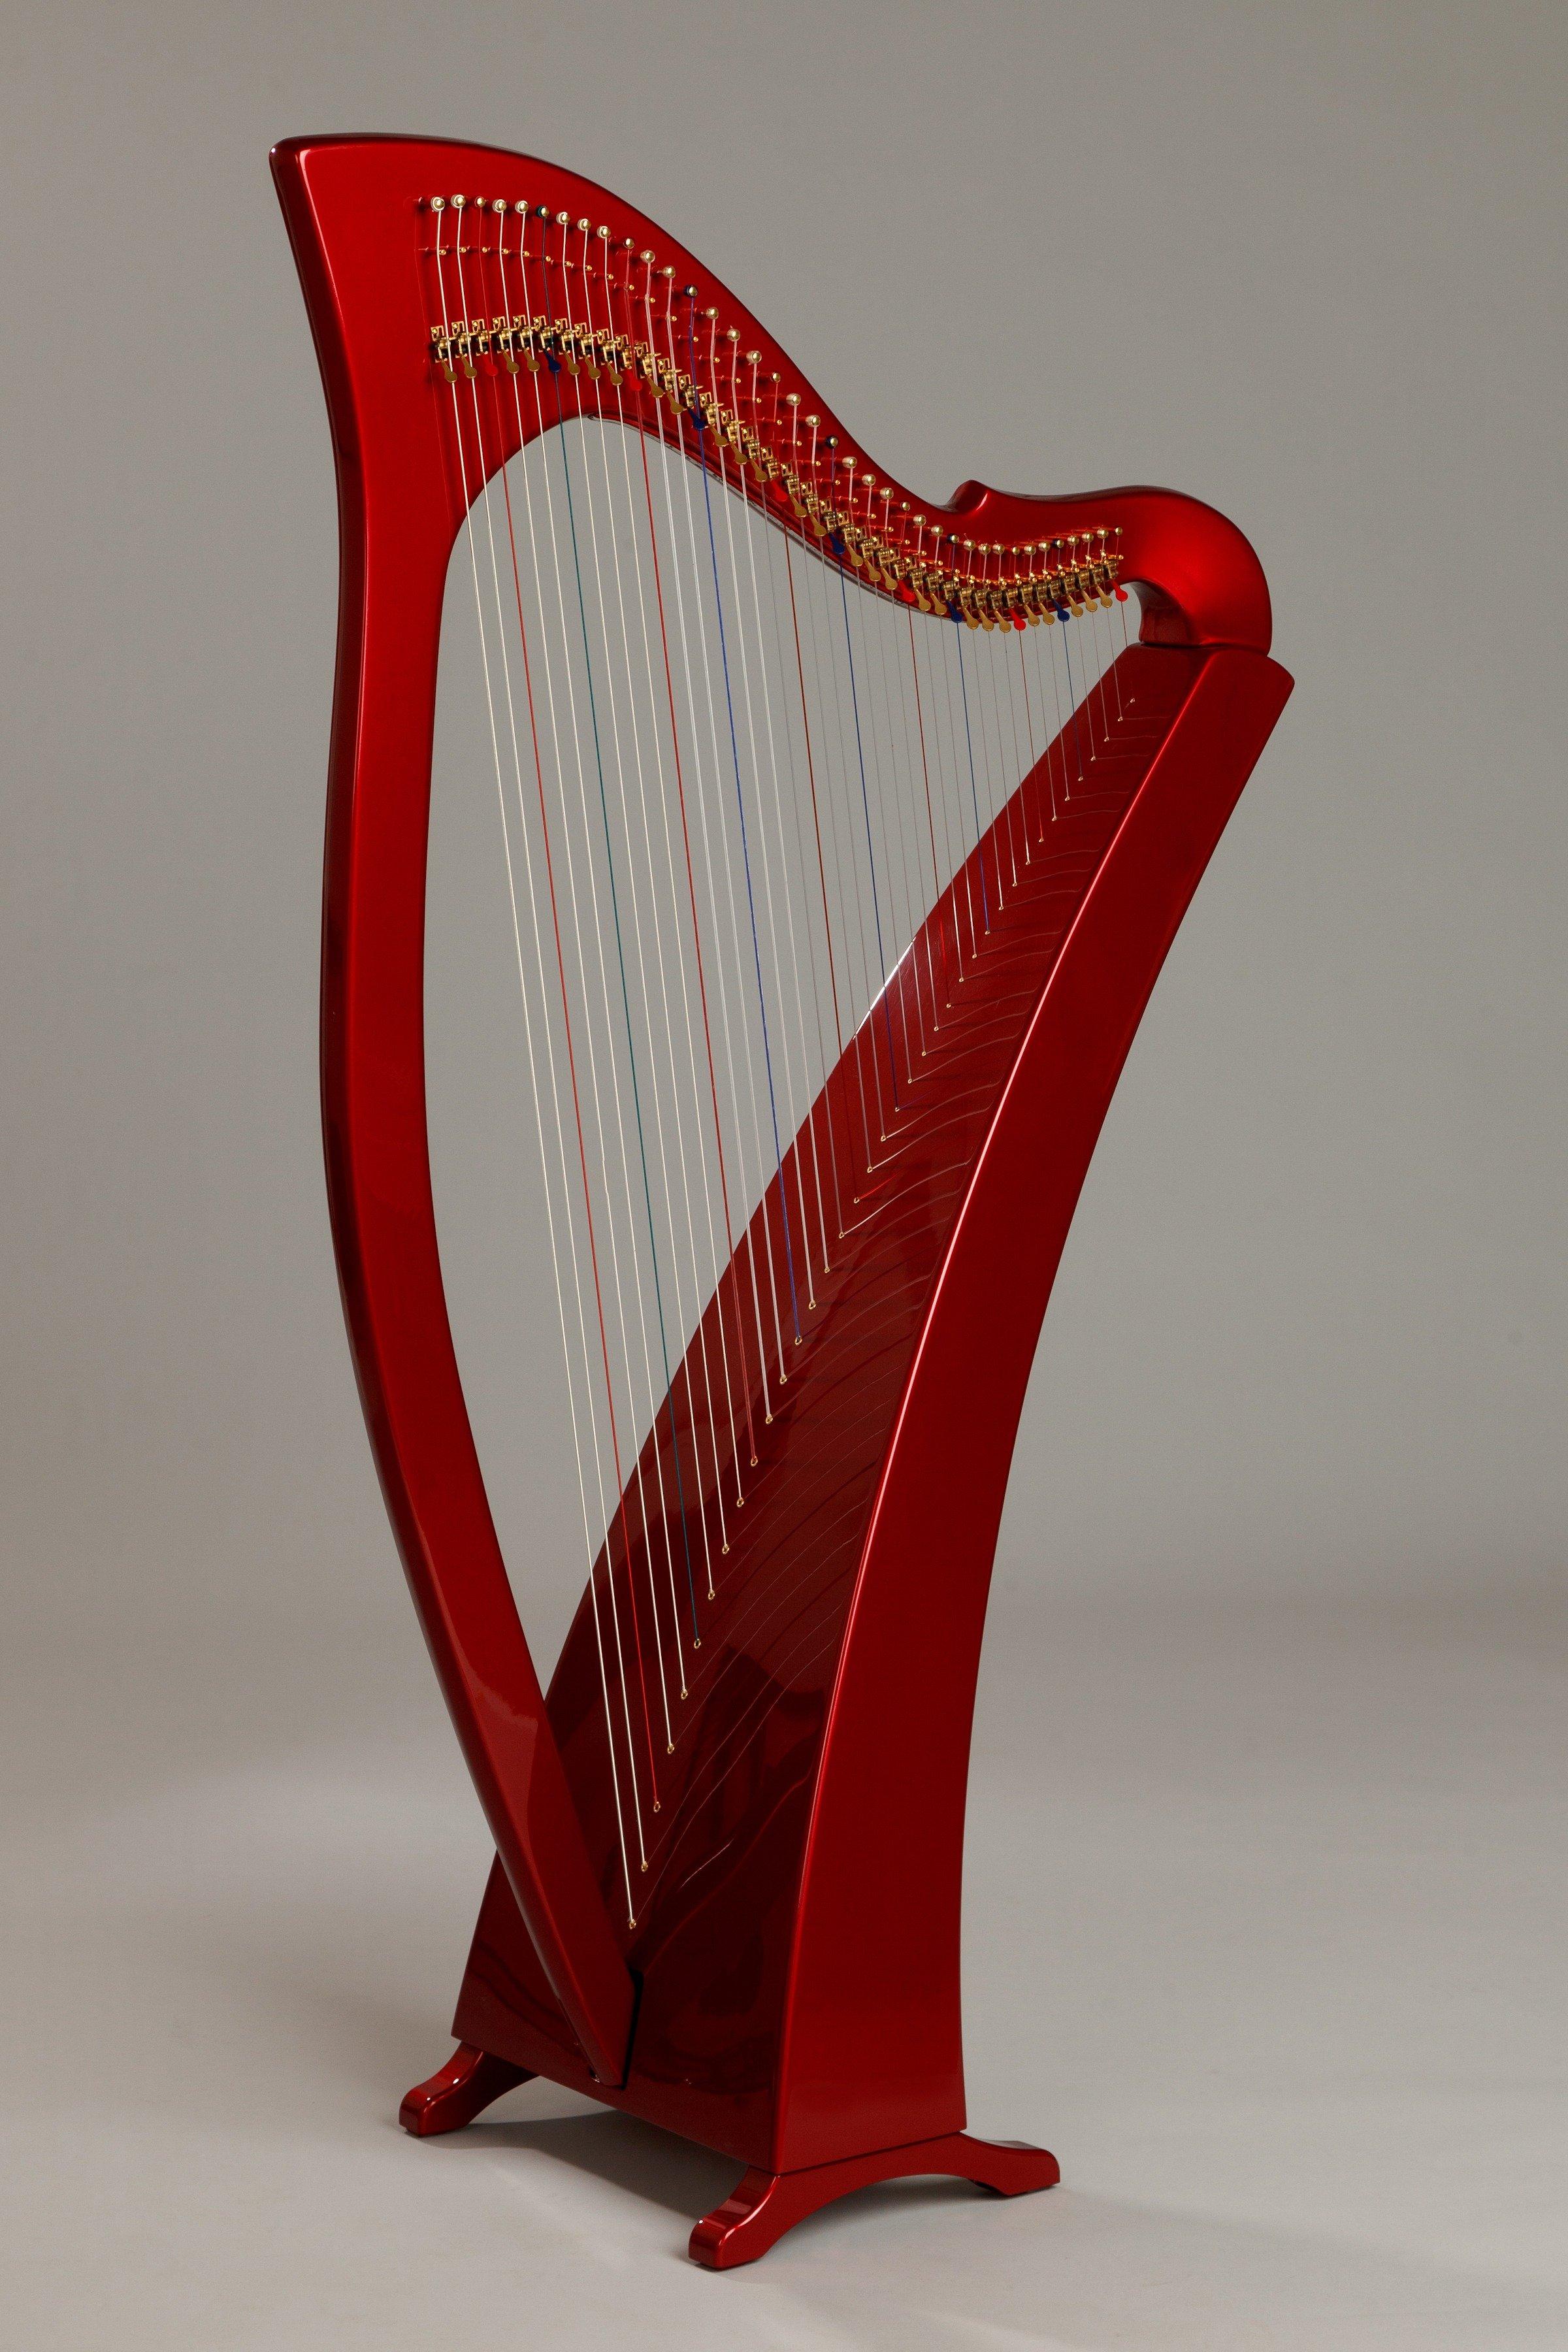 cherry red harp, painted carbon fiber harp